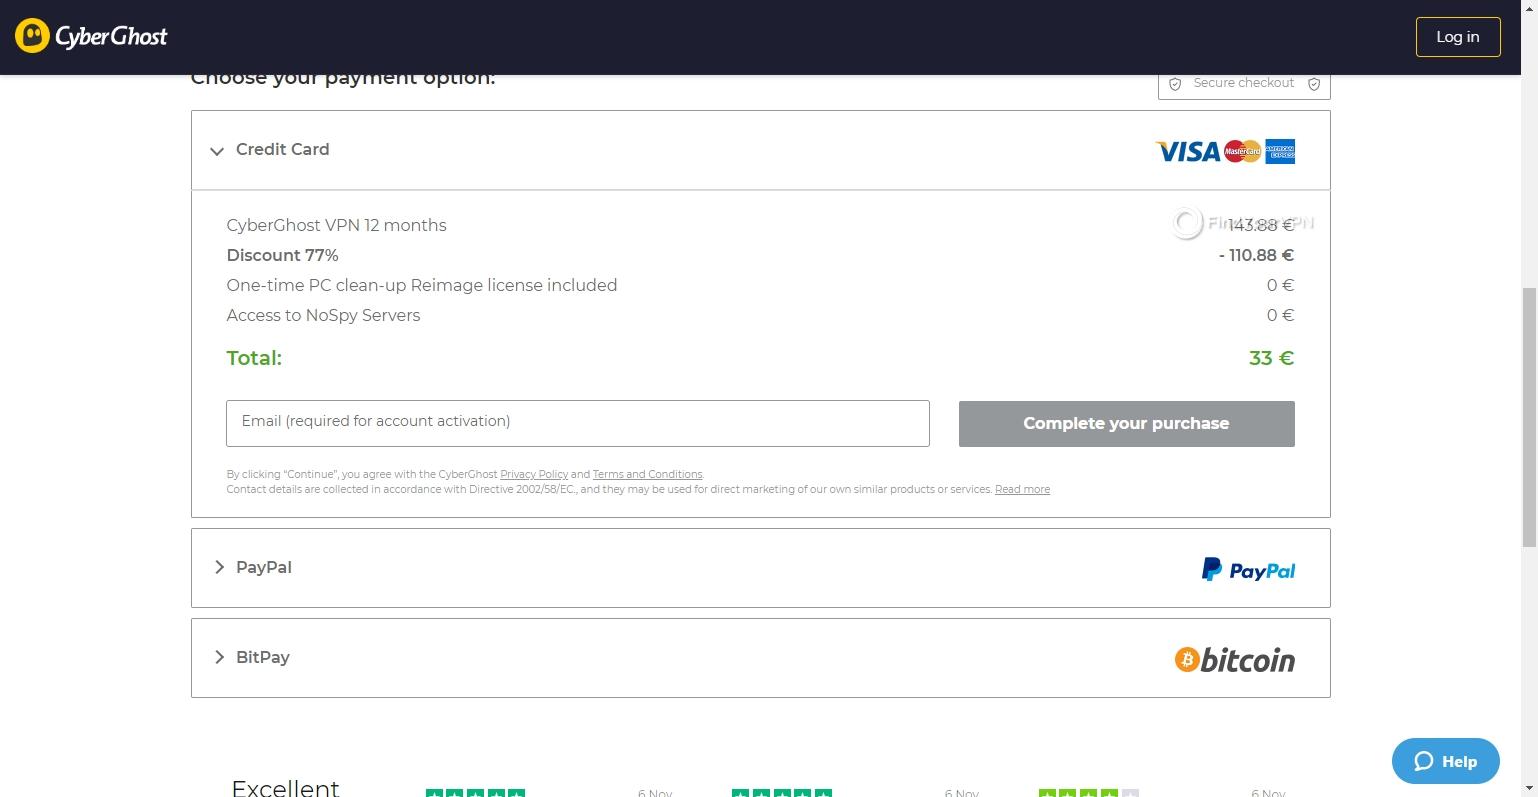 CyberGhost VPN payment methods